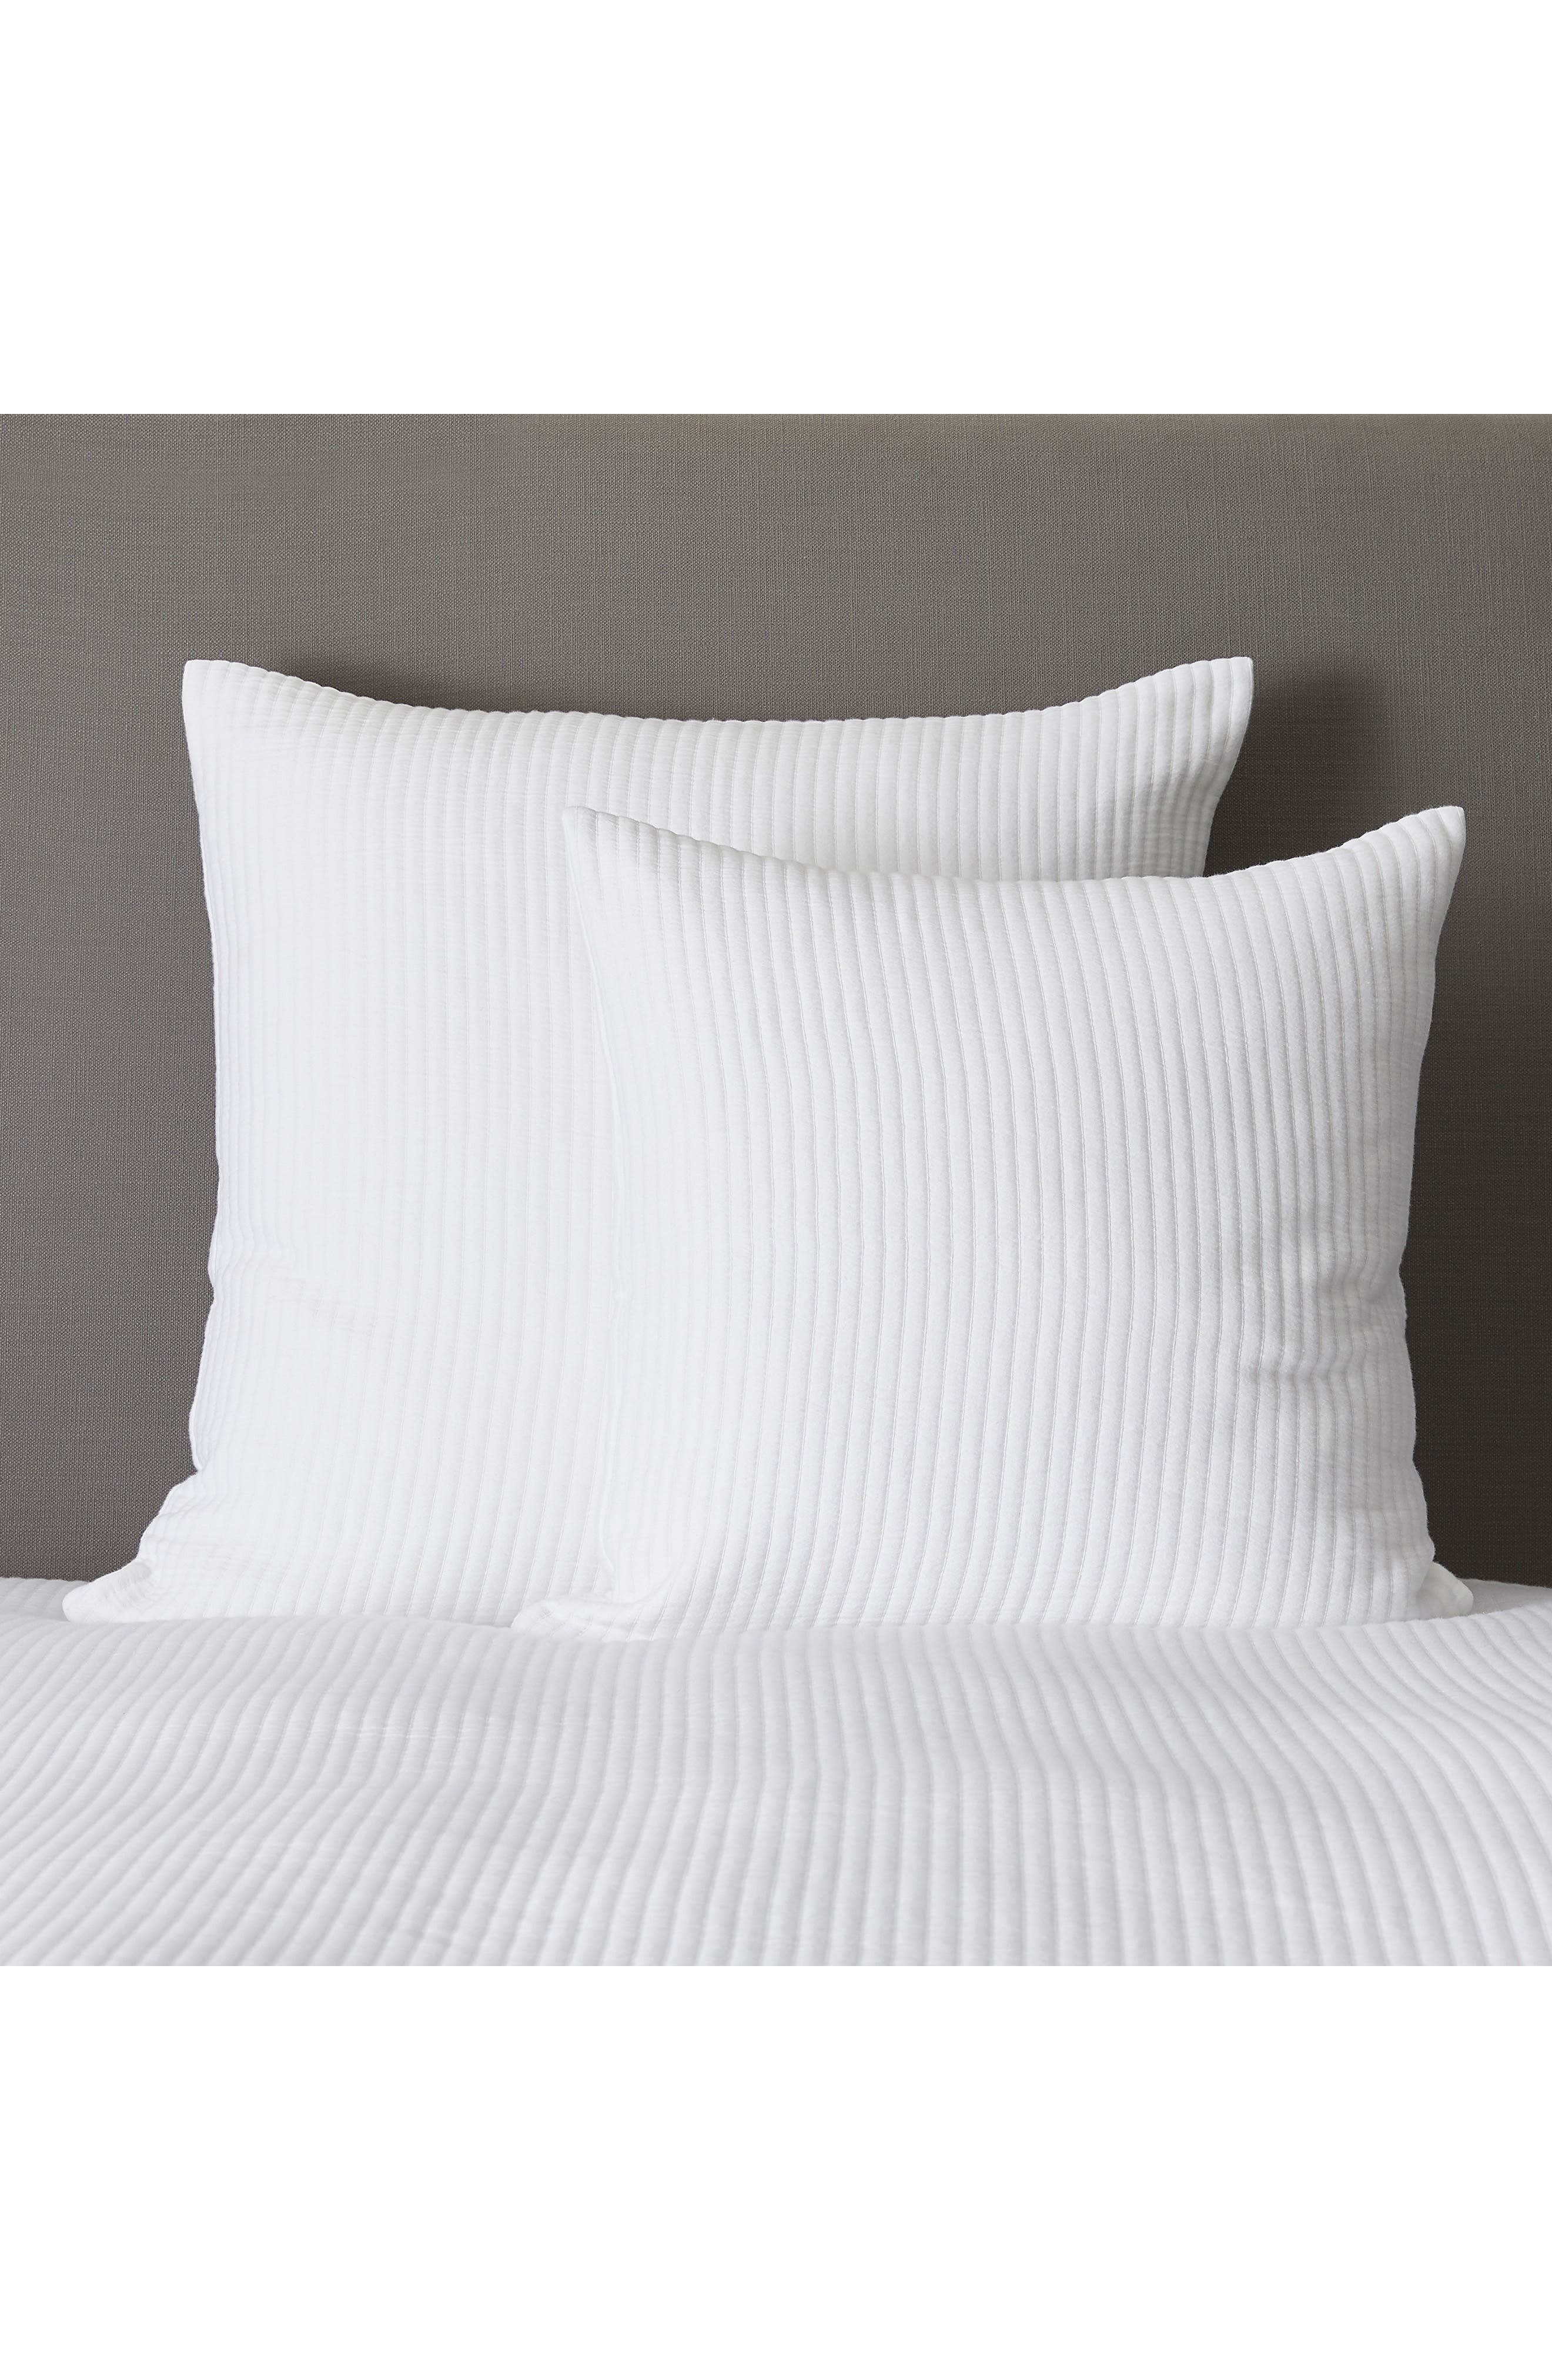 THE WHITE COMPANY,                             Classic Rib Cushion Cover,                             Main thumbnail 1, color,                             WHITE